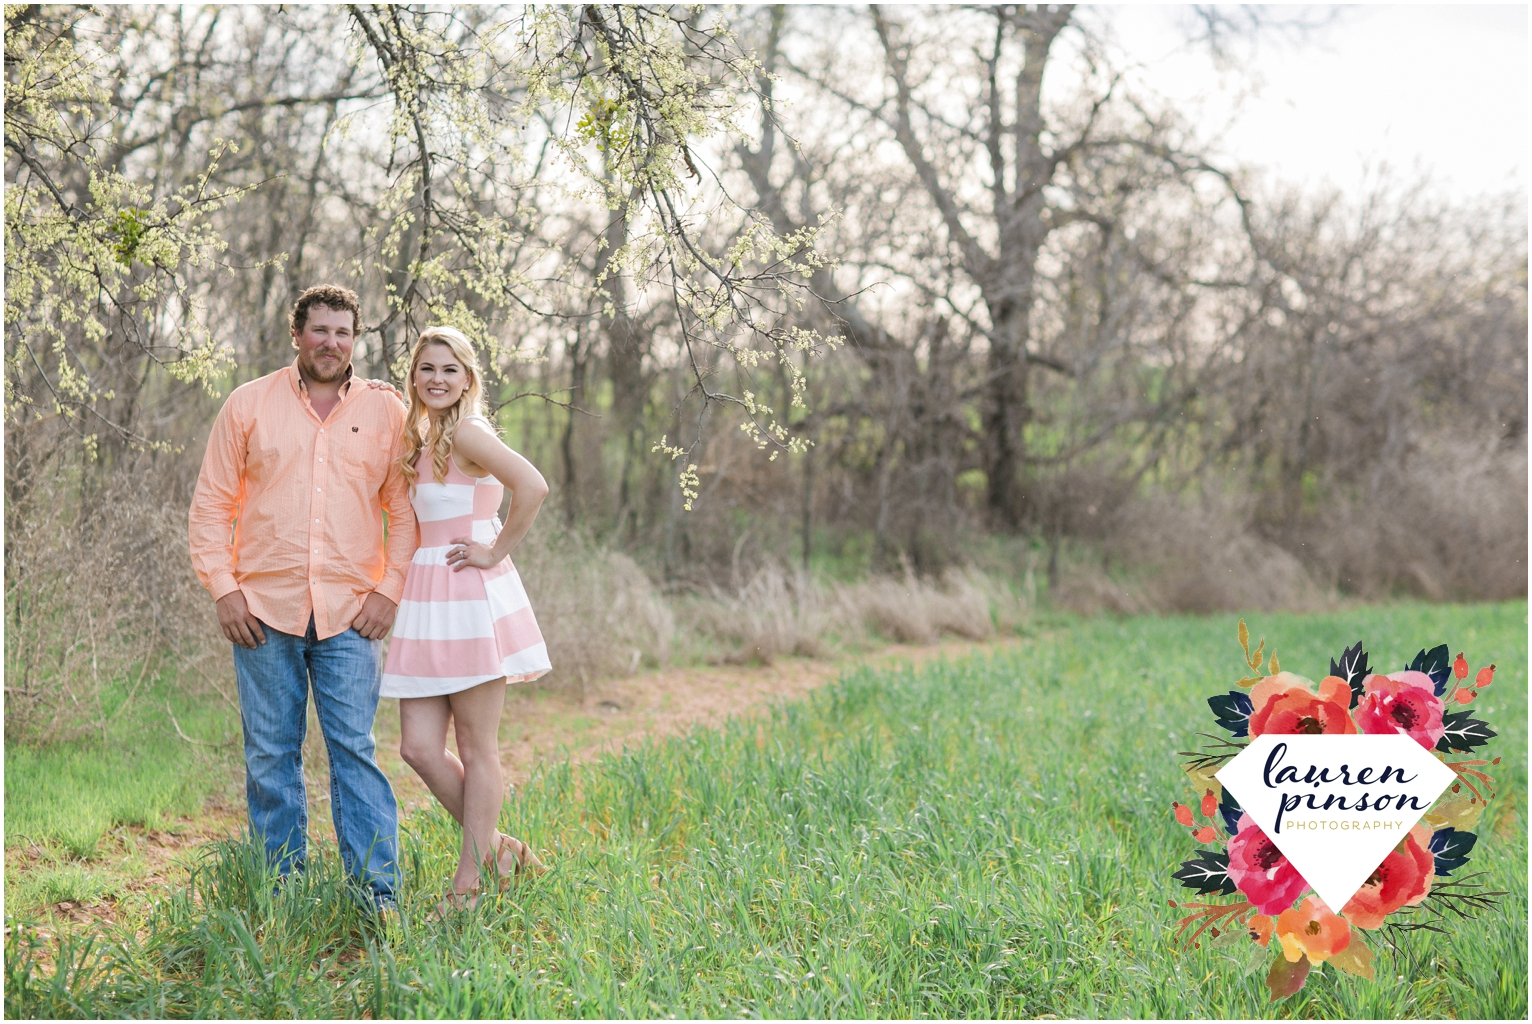 wichita-falls-wedding-photographer-engagement-session-texas-photography-oklahoma-engagement-wedding-photography_0643.jpg